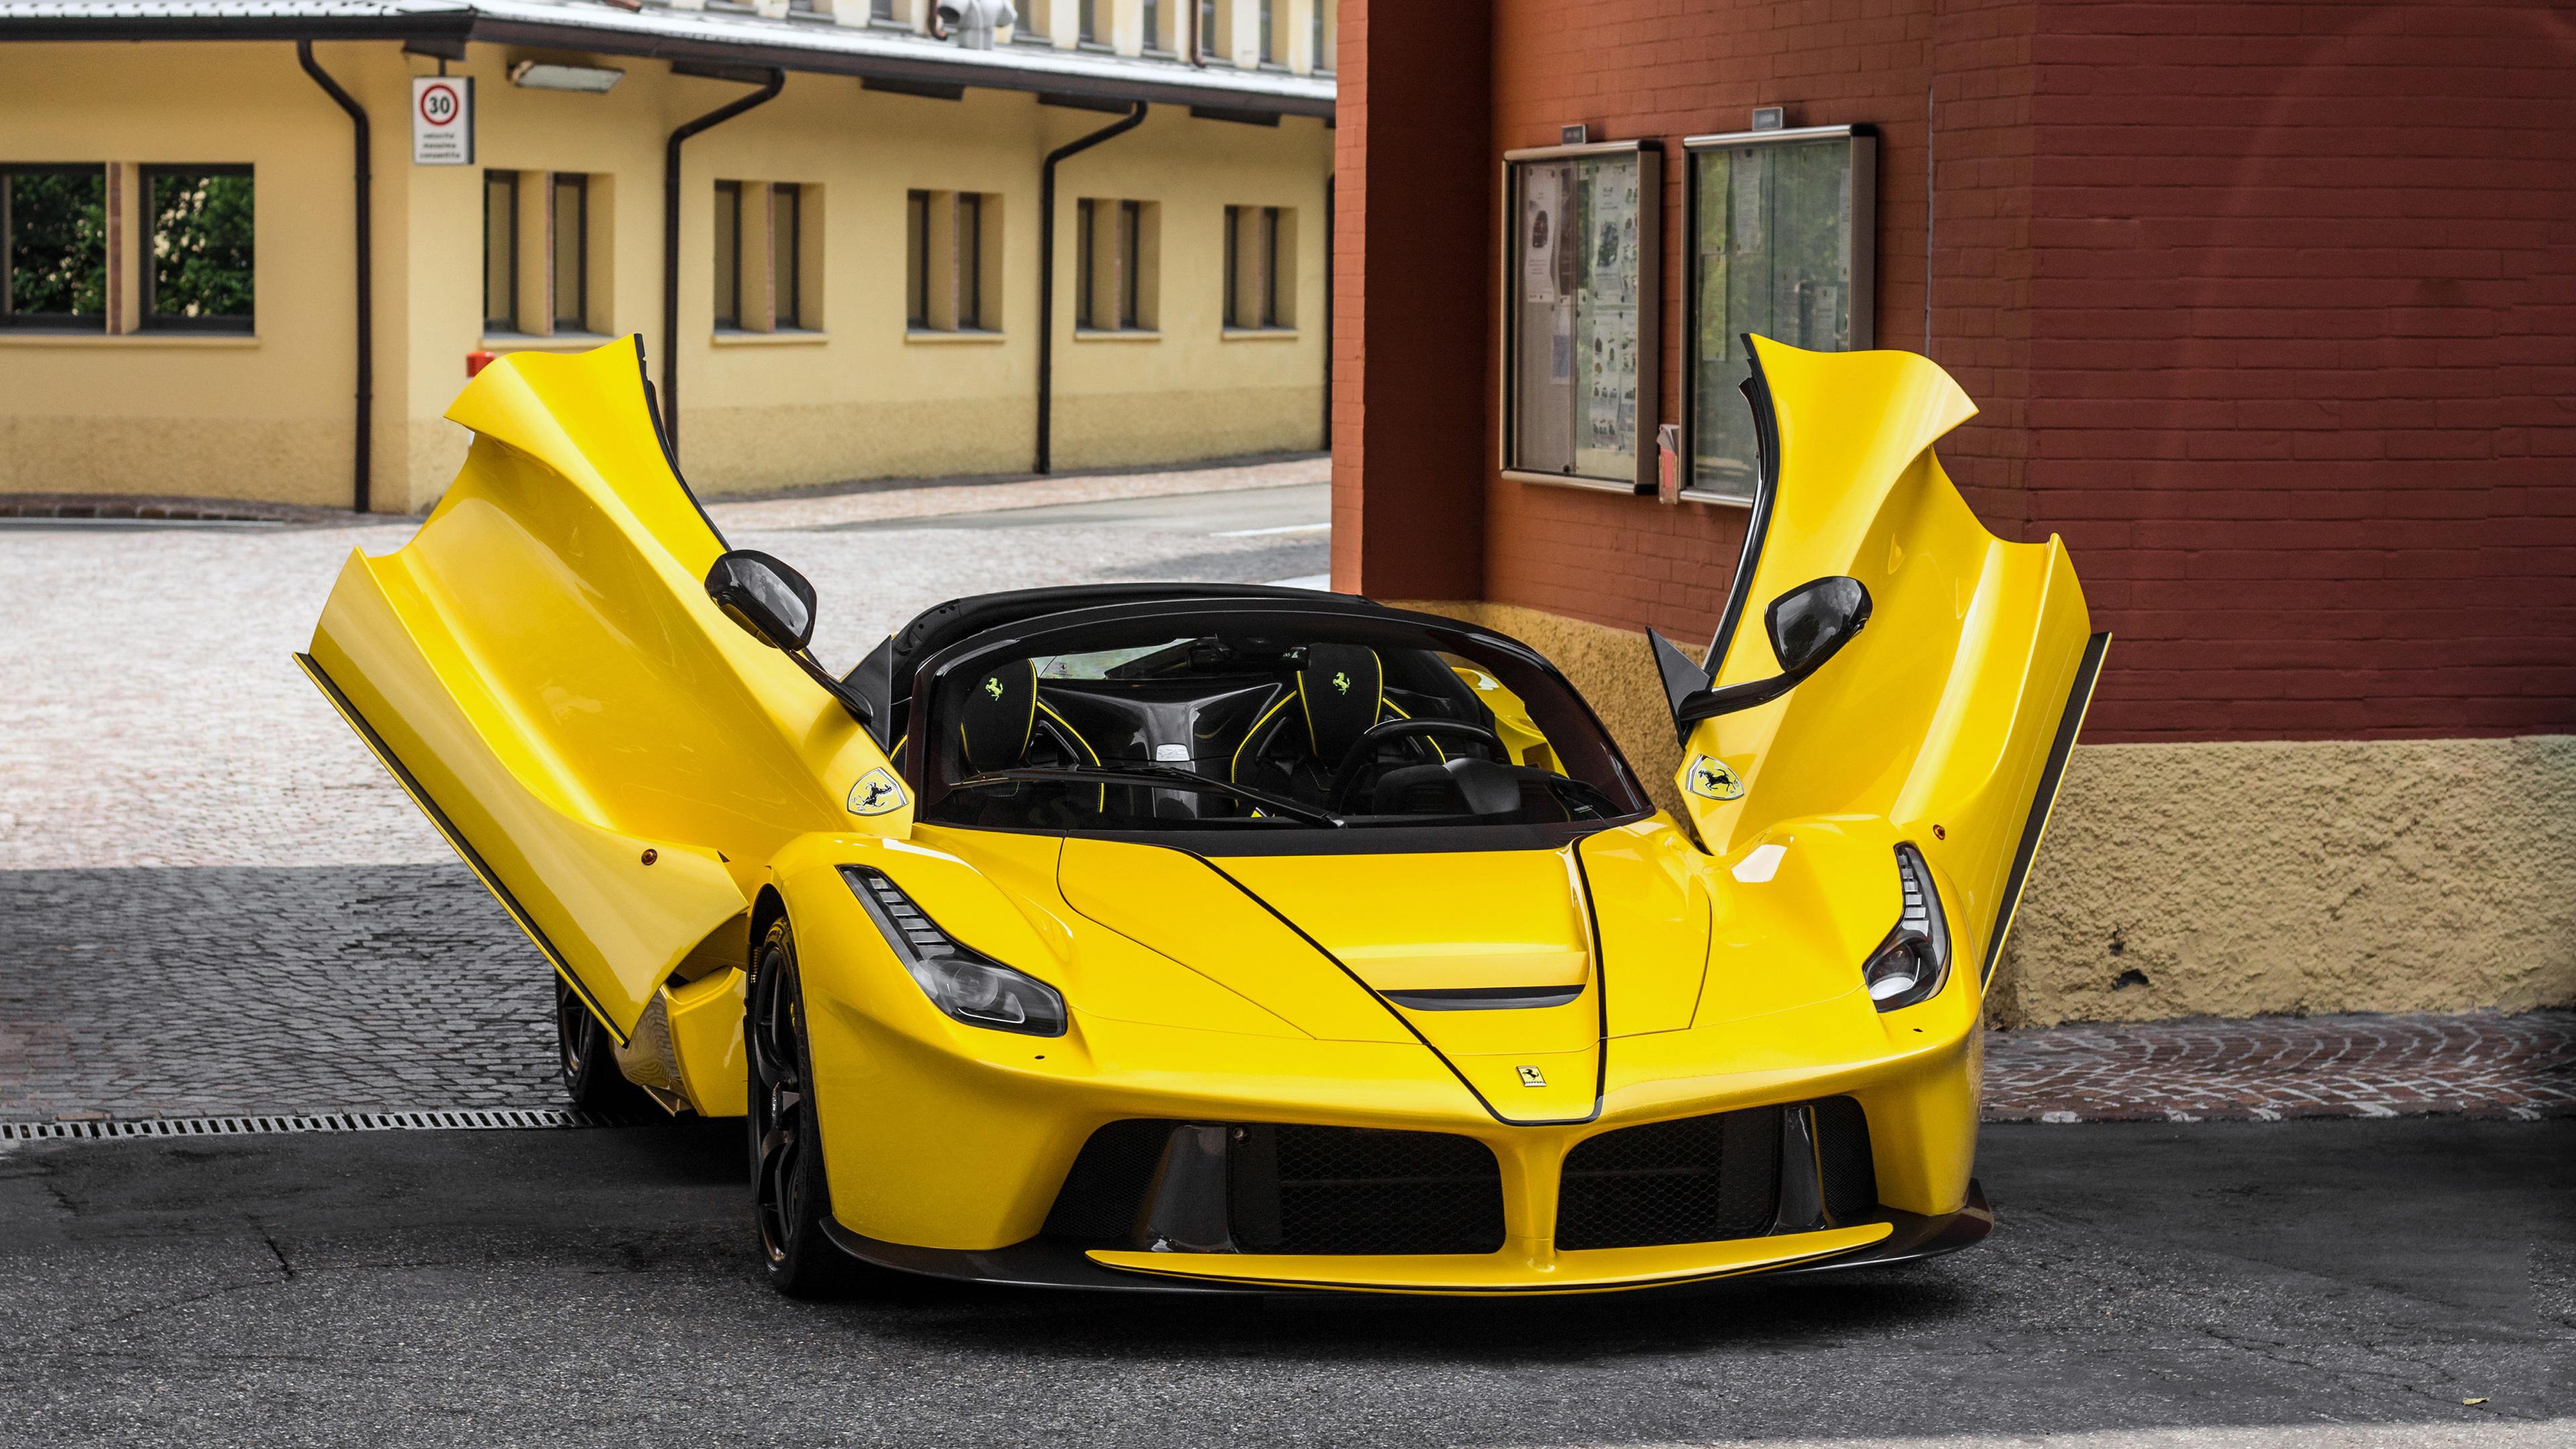 ferrari laferrari aperta 1539108668 - Ferrari LaFerrari Aperta - laferrari wallpapers, hd-wallpapers, ferrari wallpapers, cars wallpapers, 4k-wallpapers, 2017 cars wallpapers